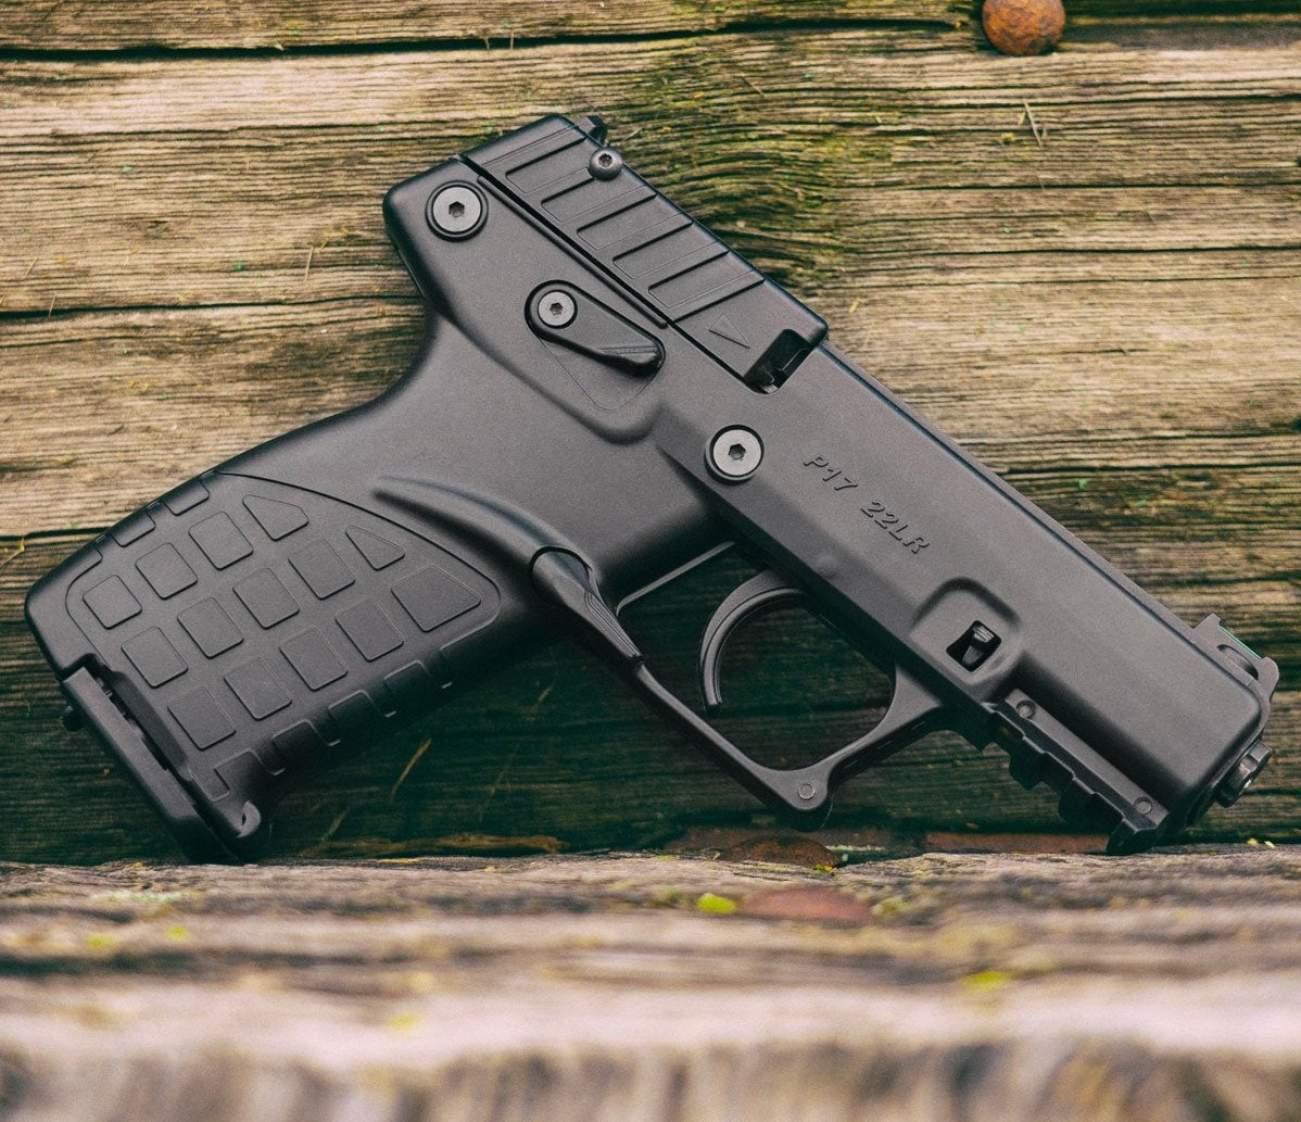 Kel Tec's P17 Compact .22LR Pistol: The Ultimate Review